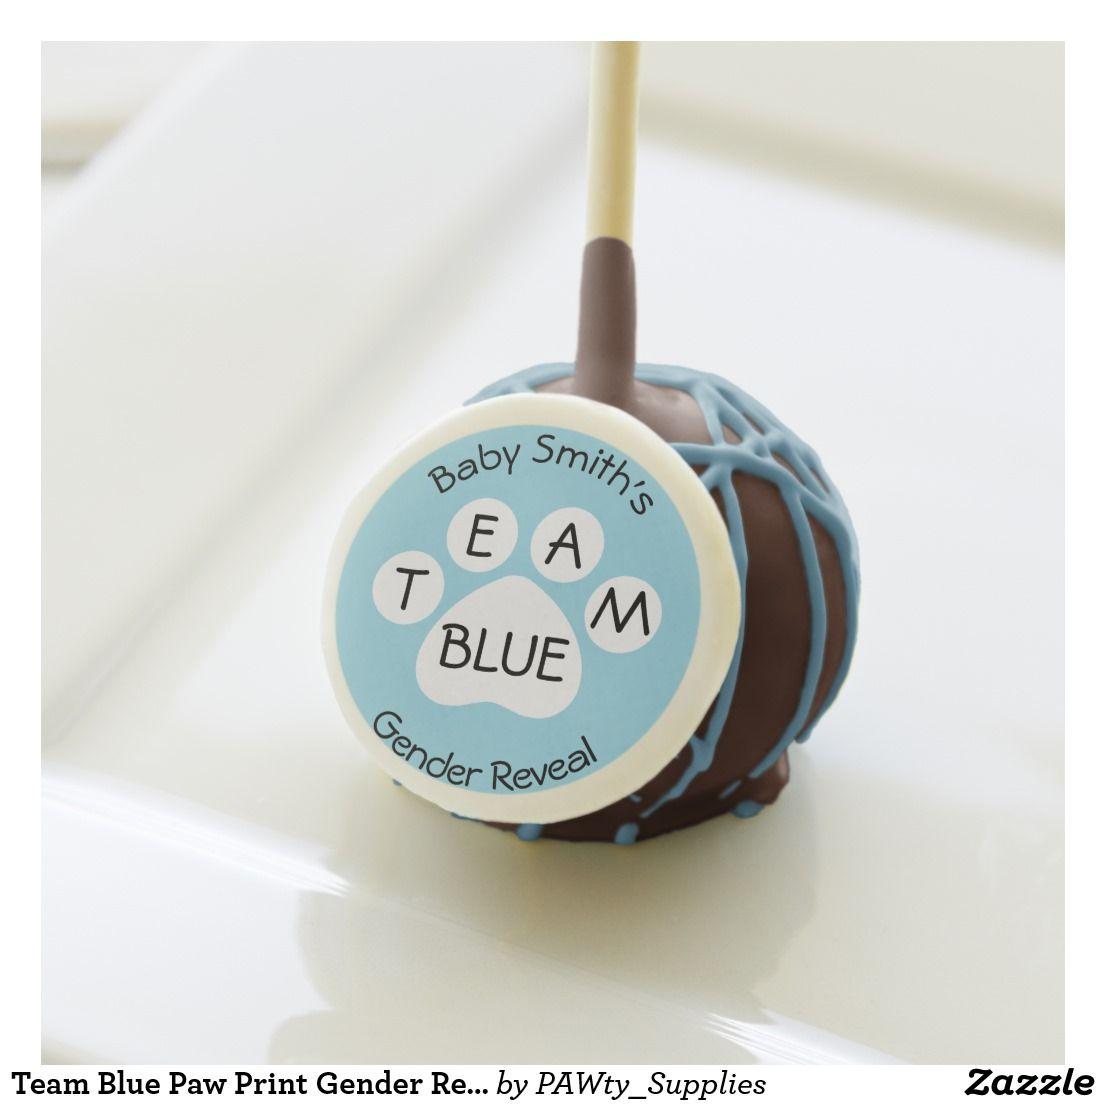 Team Blue Paw Print Gender Reveal Cake Pops Zazzle Com Gender Reveal Cake Pops Gender Reveal Cake Cake Pop Displays